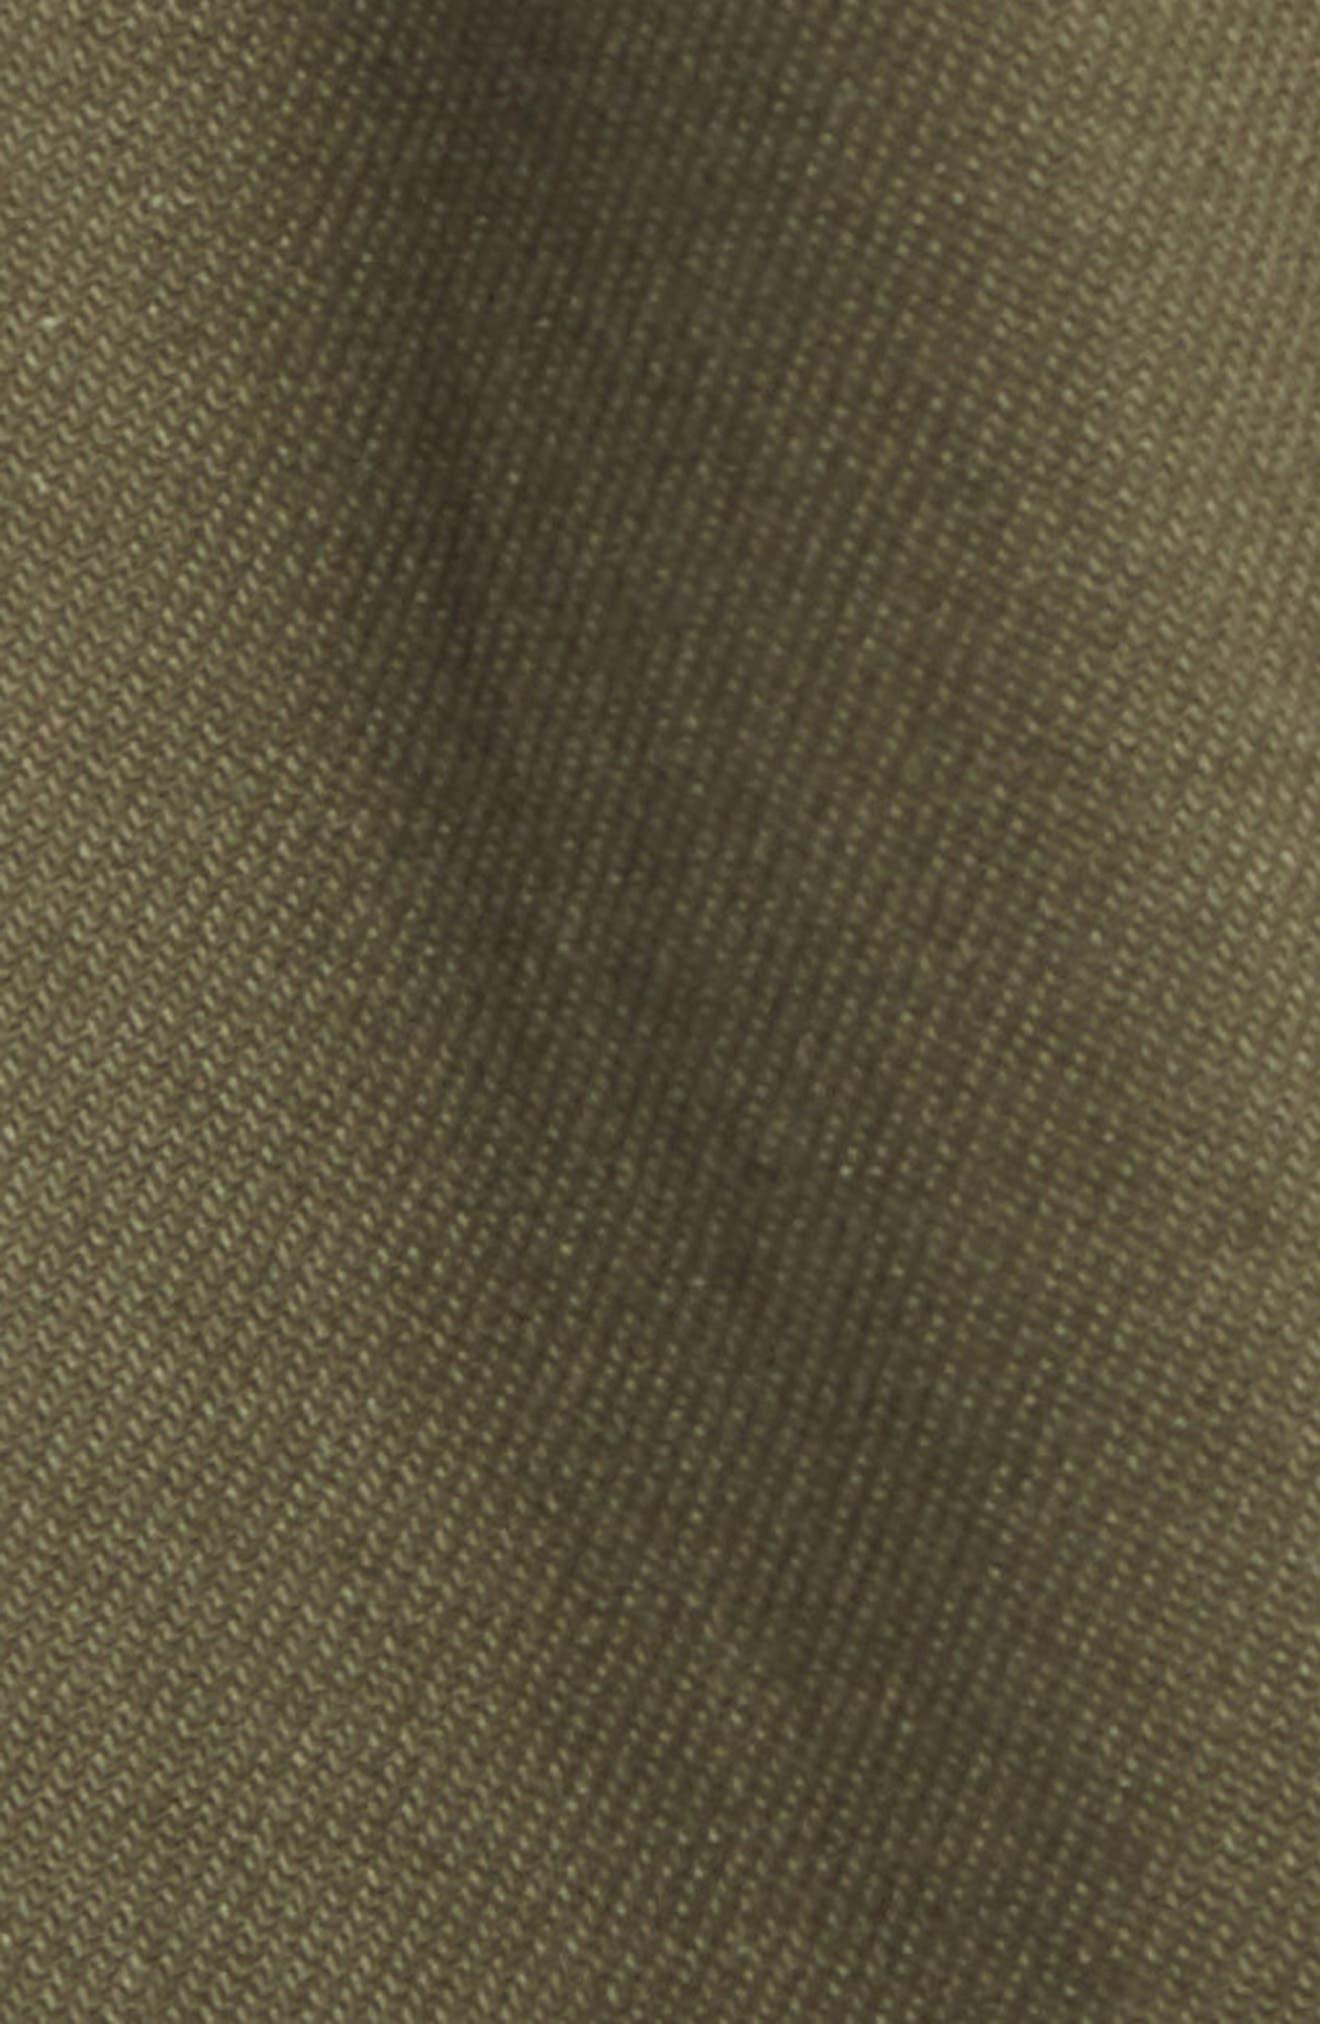 Stretch Cotton Trucker Jacket,                             Alternate thumbnail 6, color,                             301